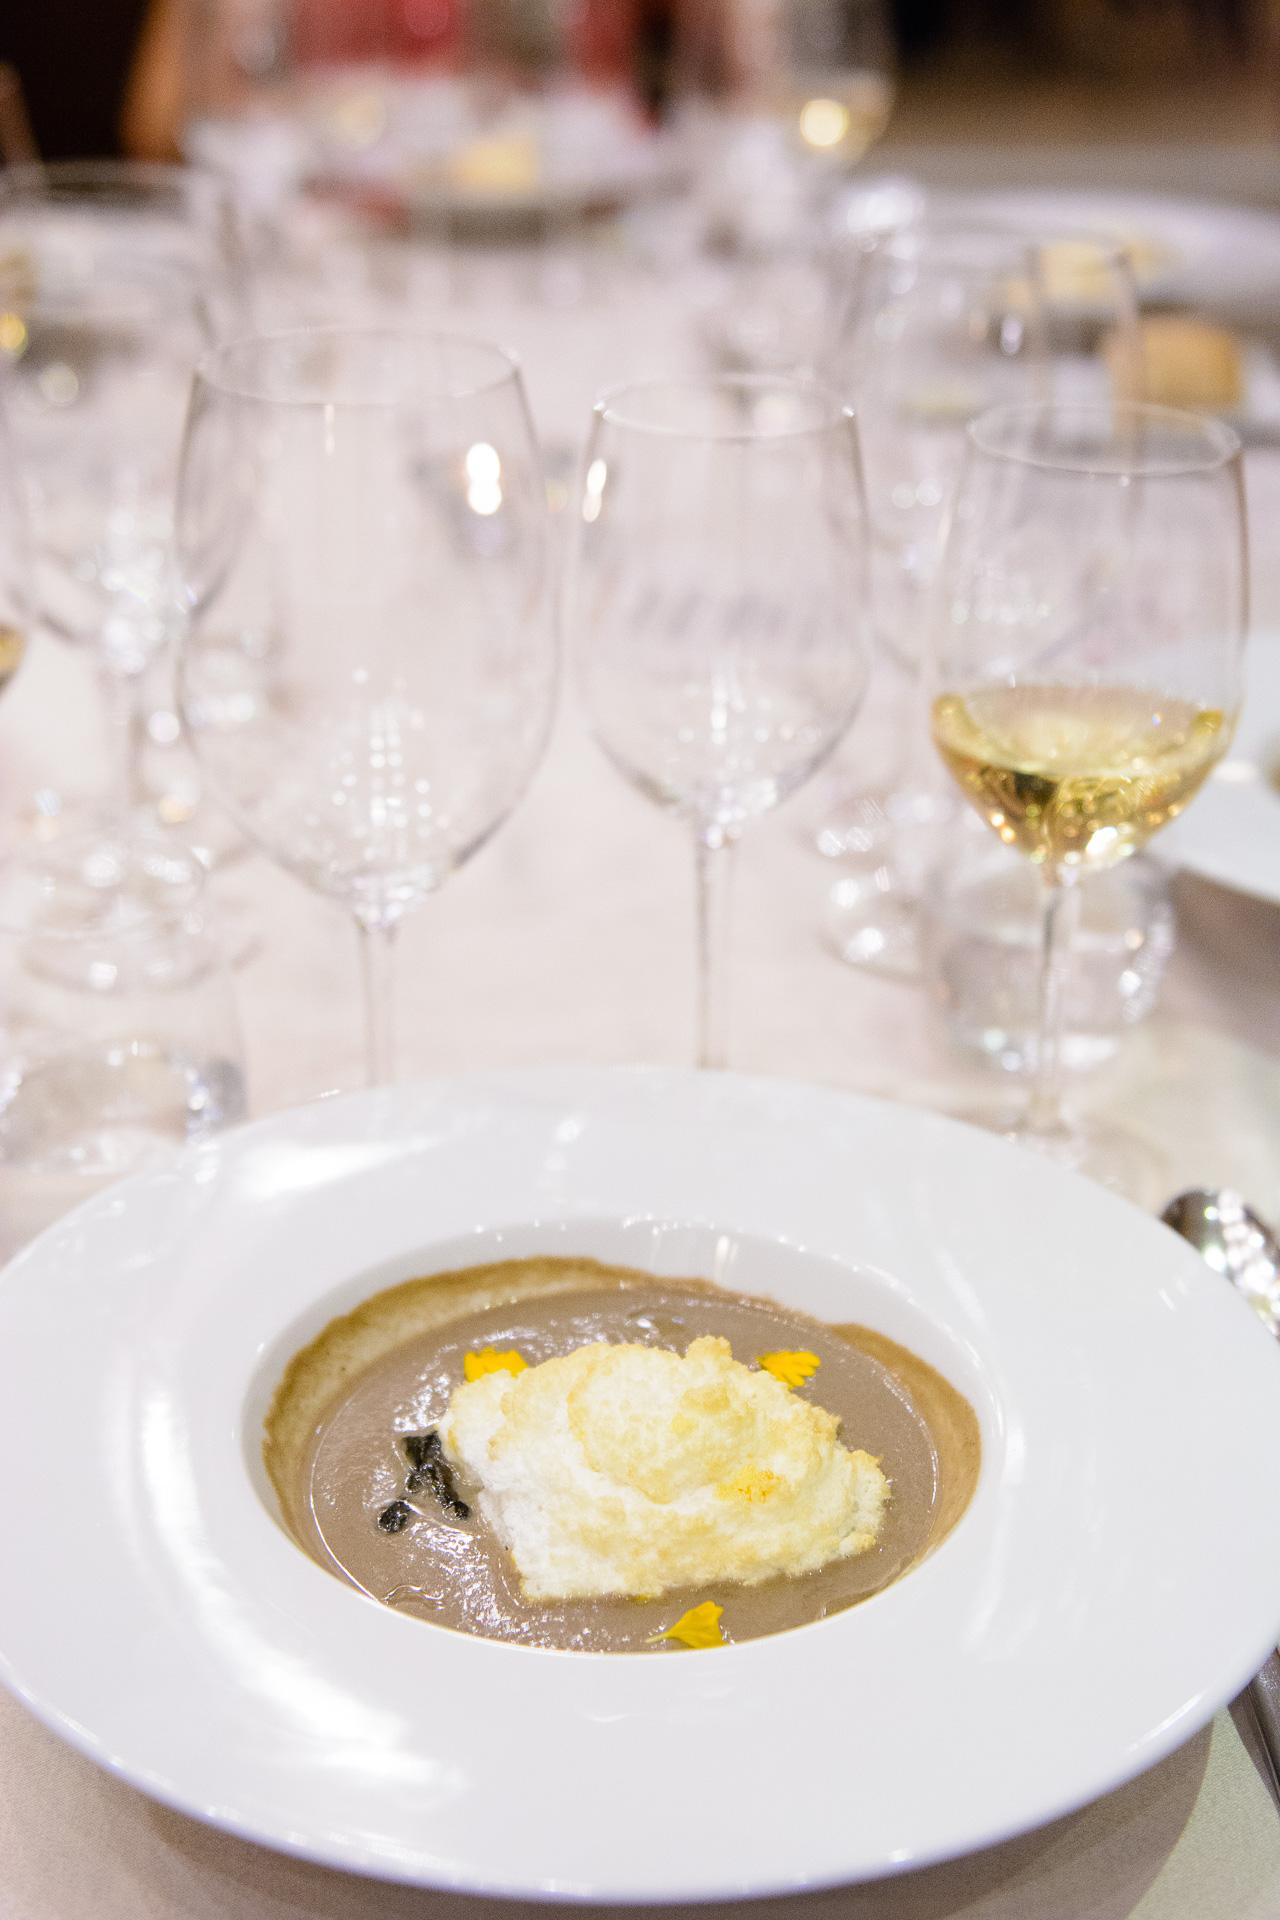 Dish by Chef Jordi Esteve